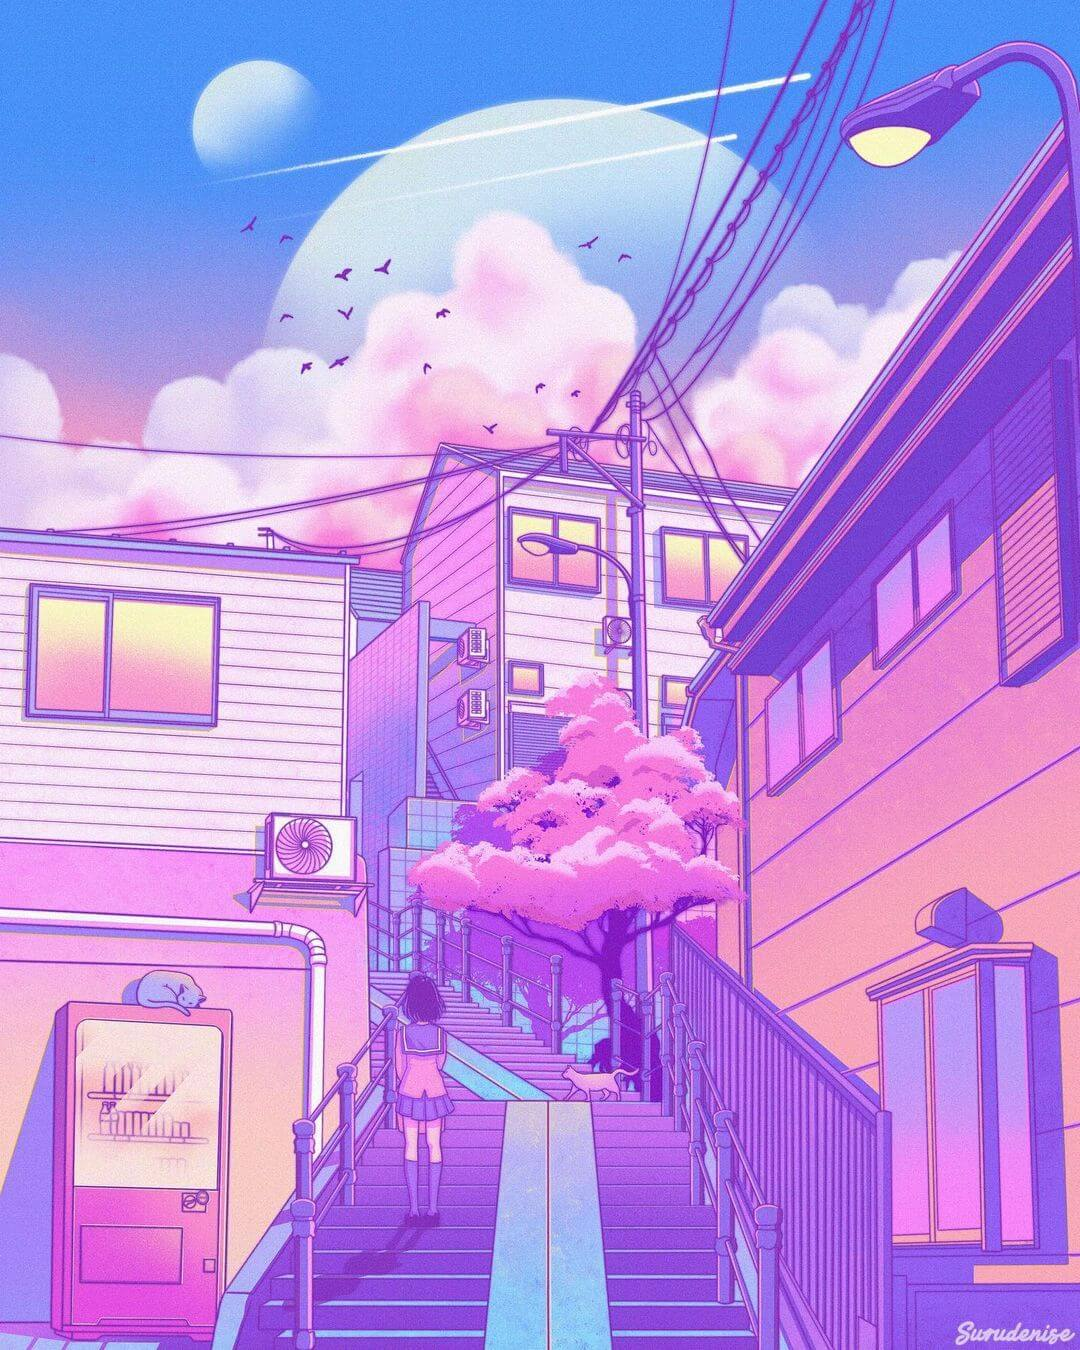 Neon Pastel-style artwork